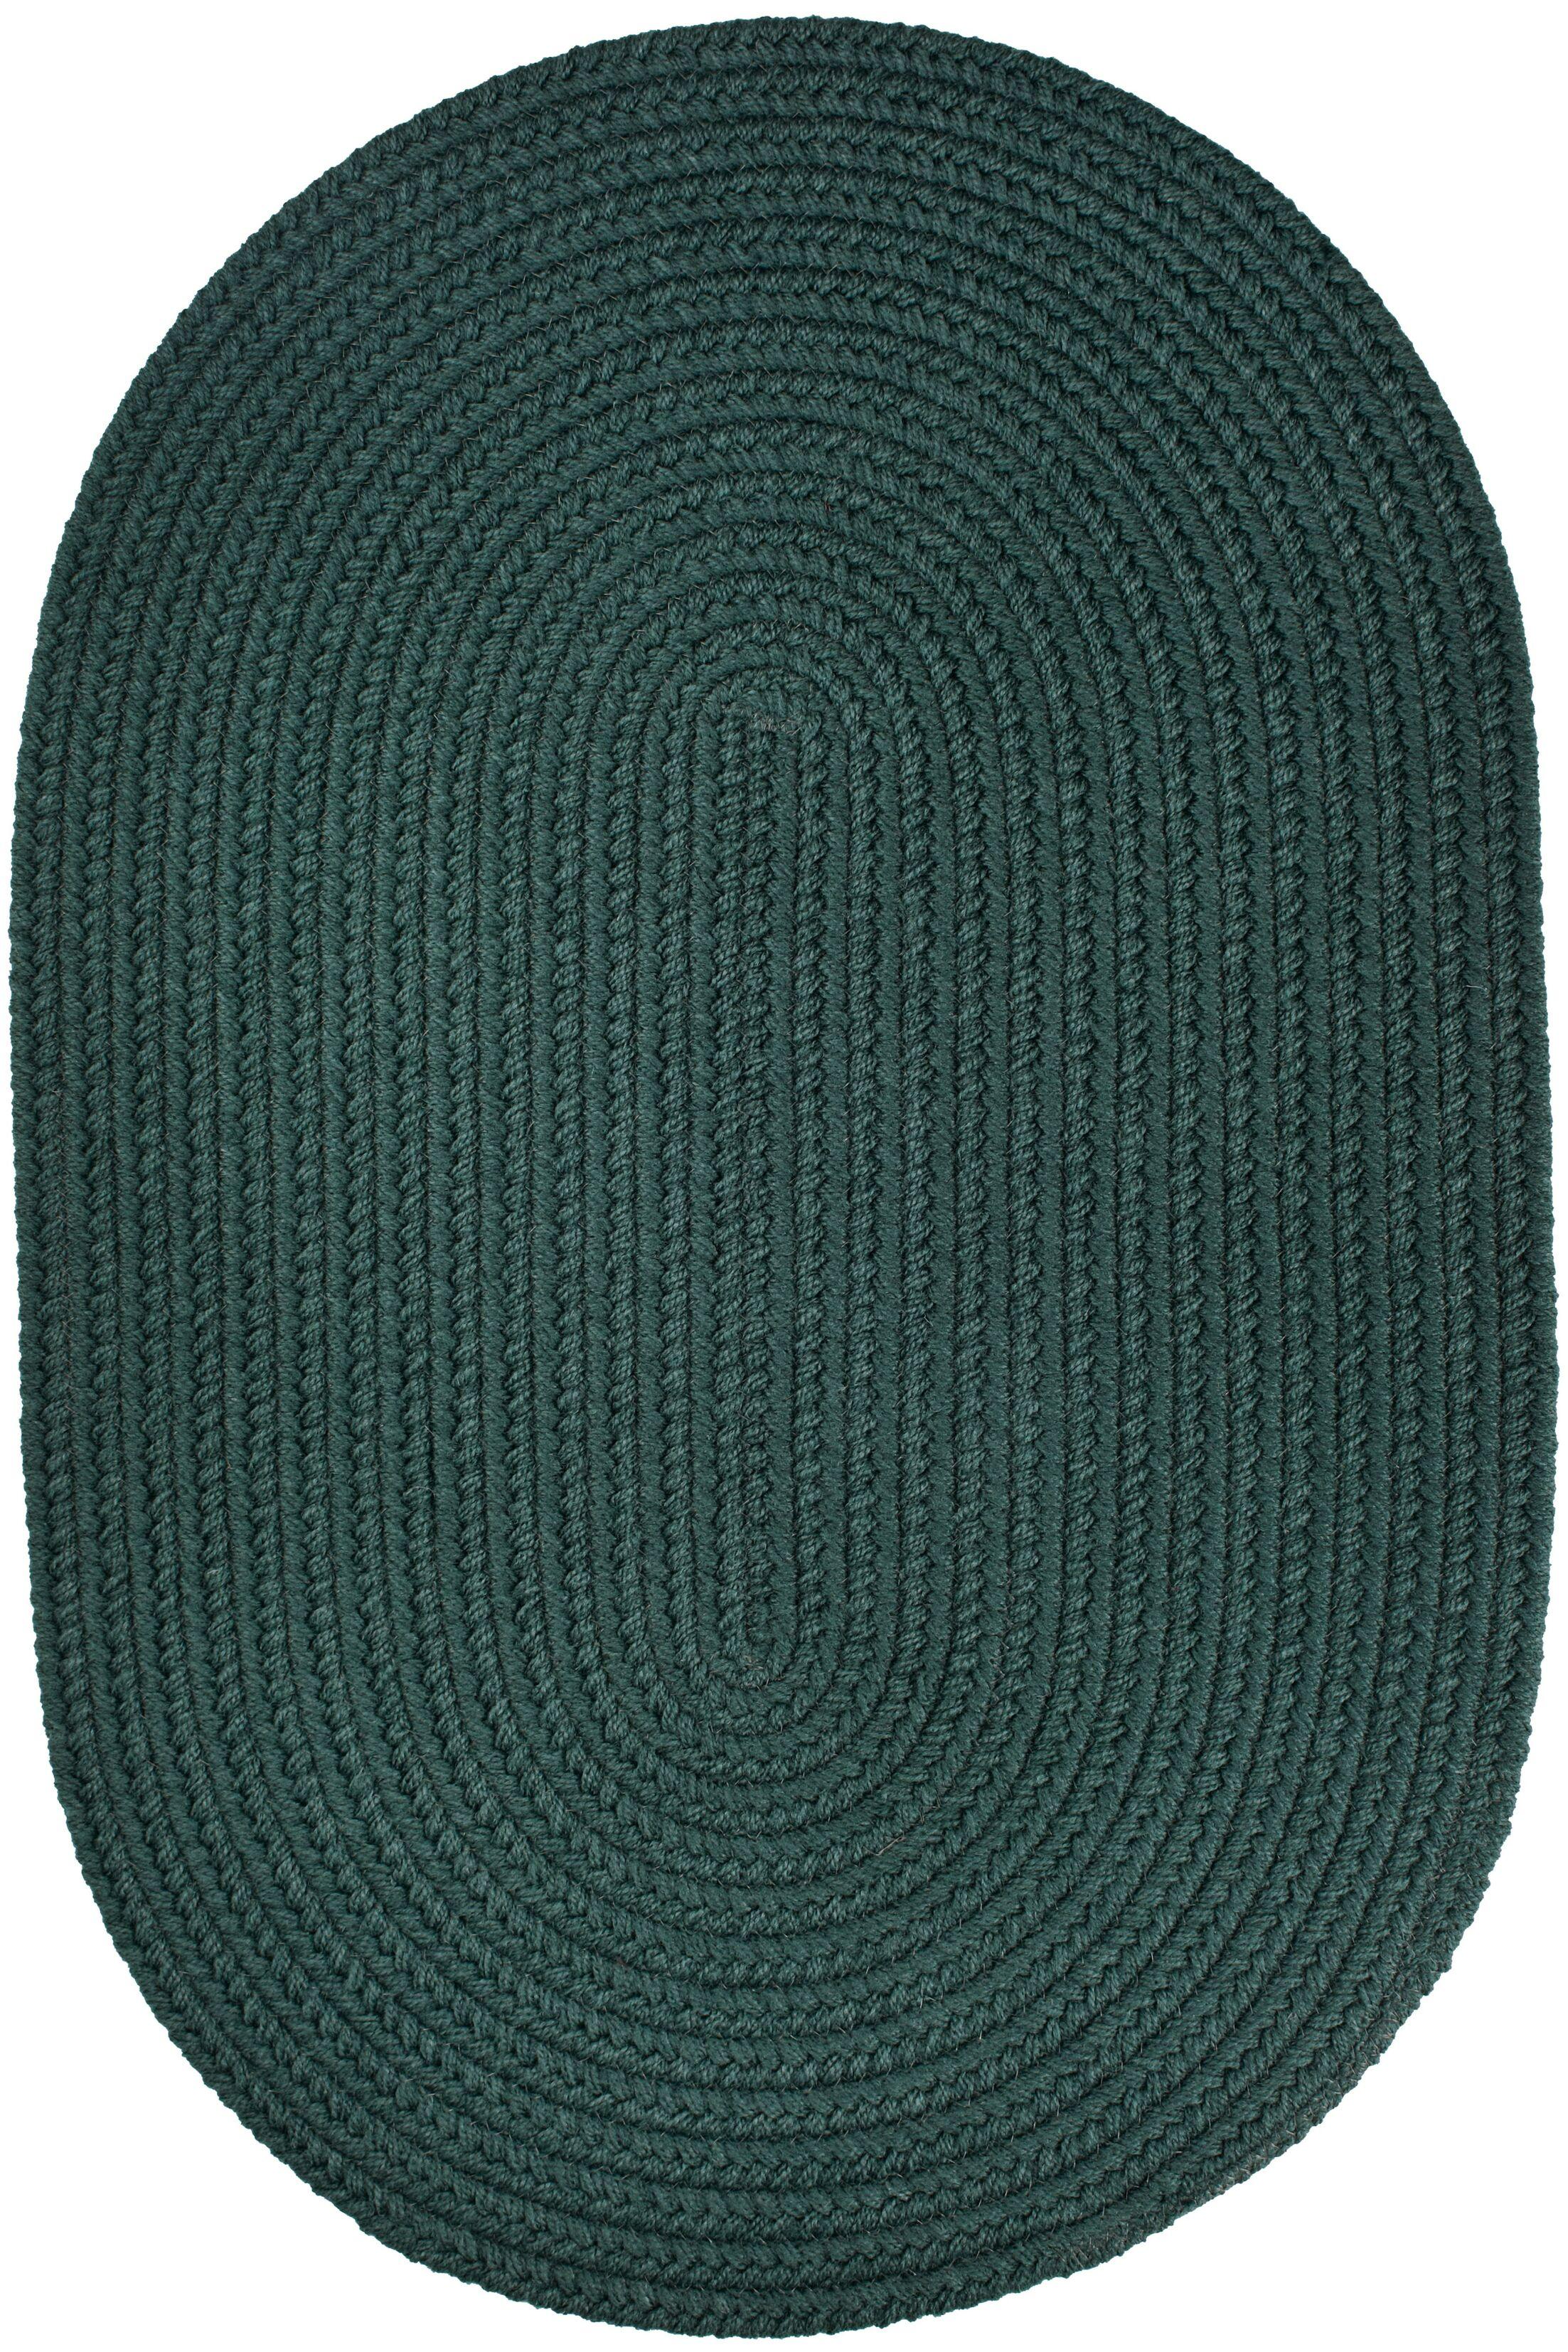 Handmade Spruce Green Indoor/Outdoor Area Rug Rug Size: Oval 7' x 9'